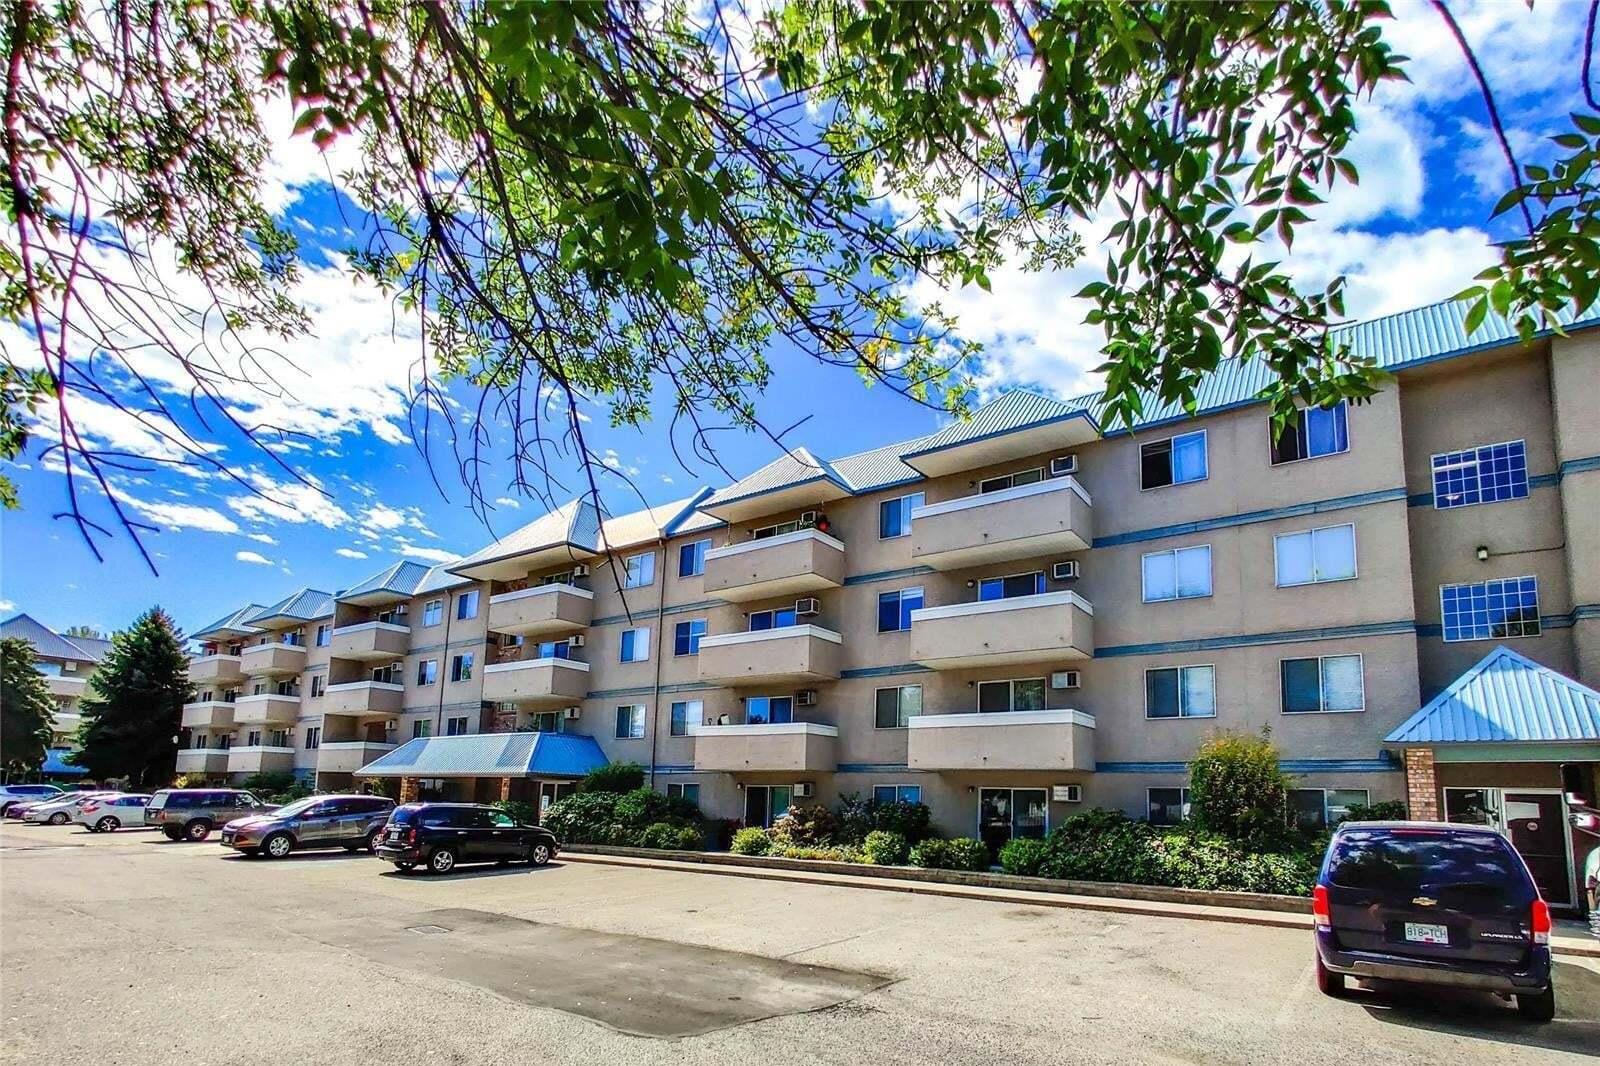 Condo for sale at 3160 De Montreuil Ct Kelowna British Columbia - MLS: 10213071